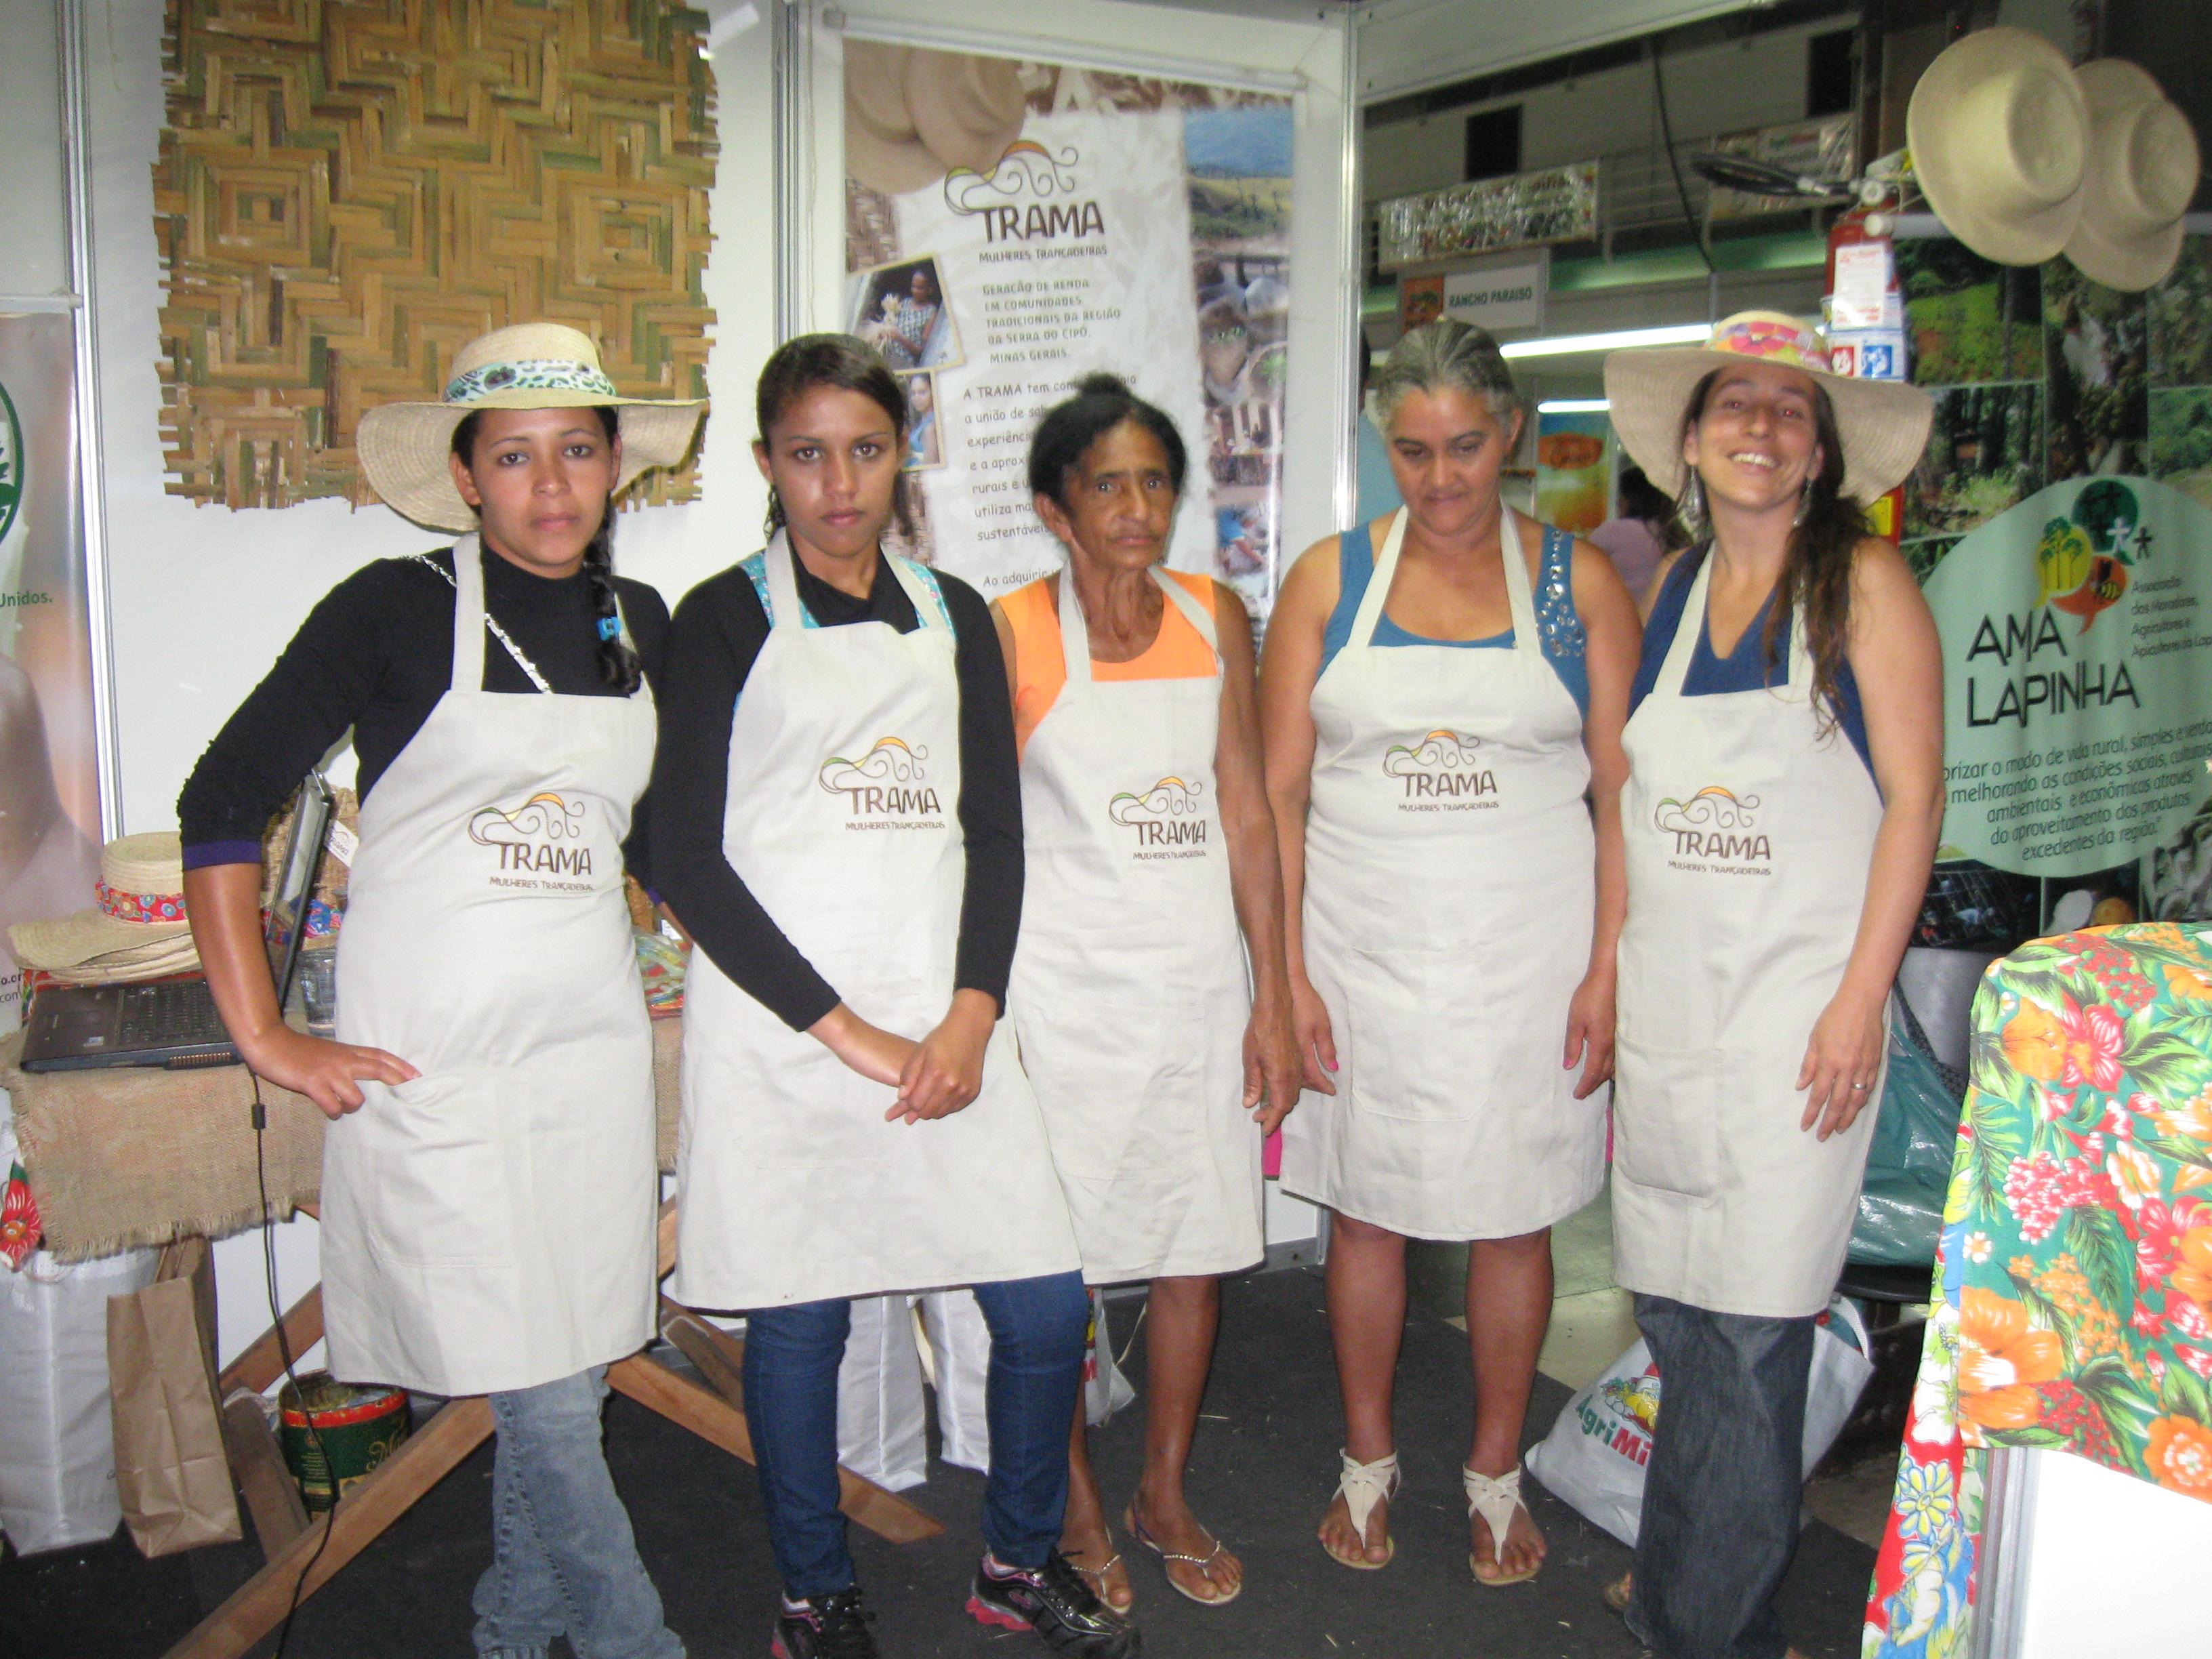 Grupo Trama na AGRIMINAS. Foto: AMA LAPINHA.